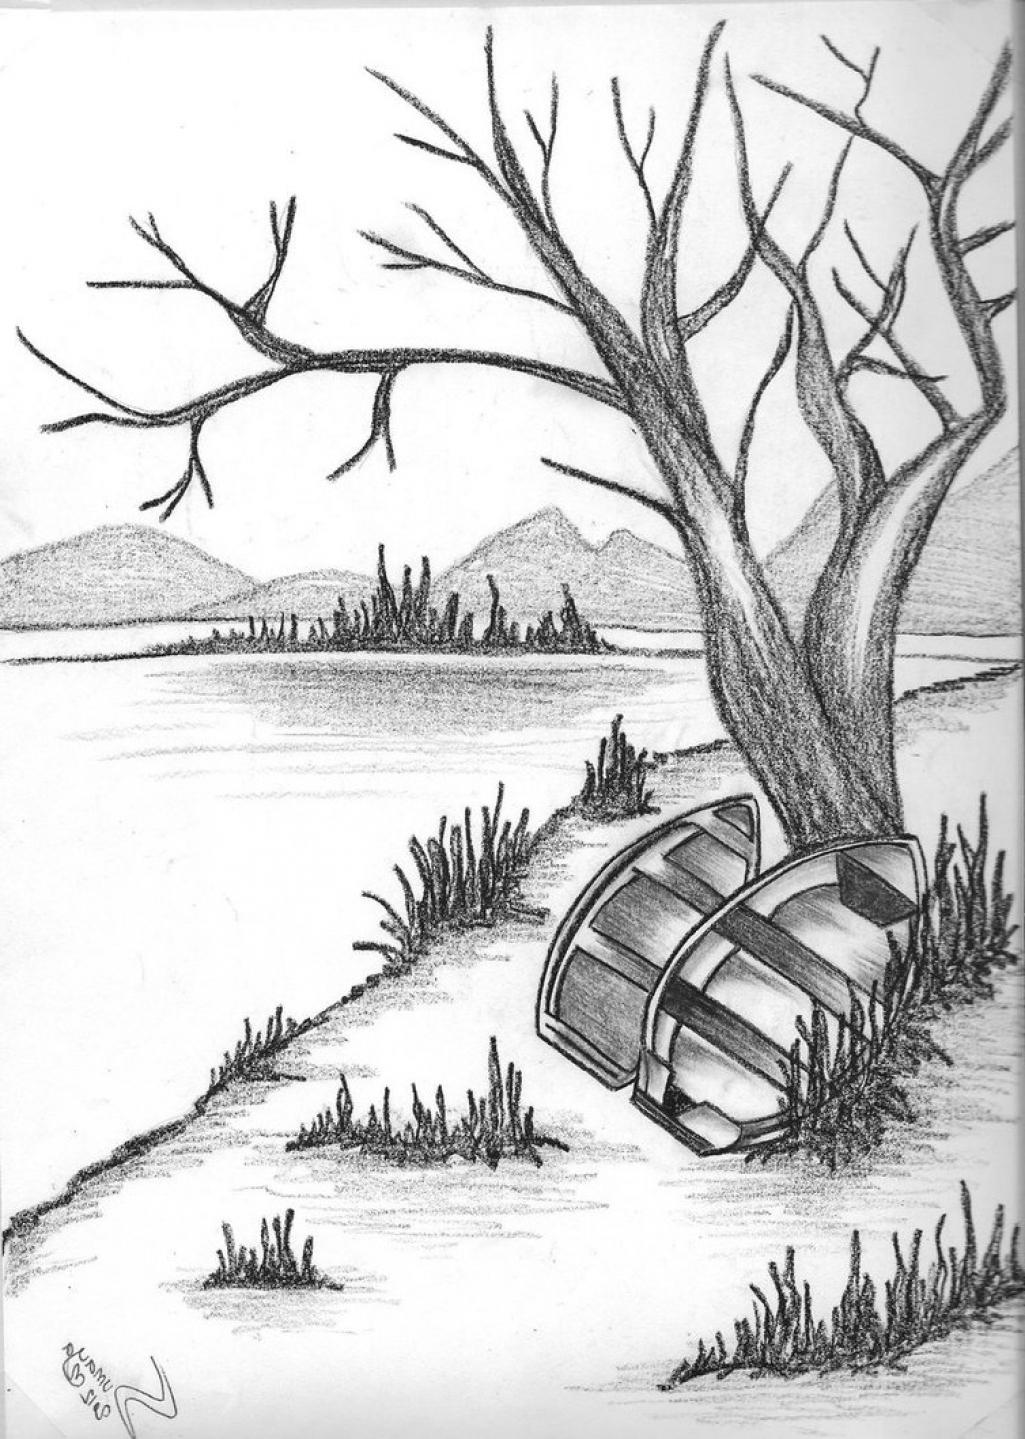 1025x1439 Pencil Sketches Of Natural Disasters Pencil Drawings Of Natural